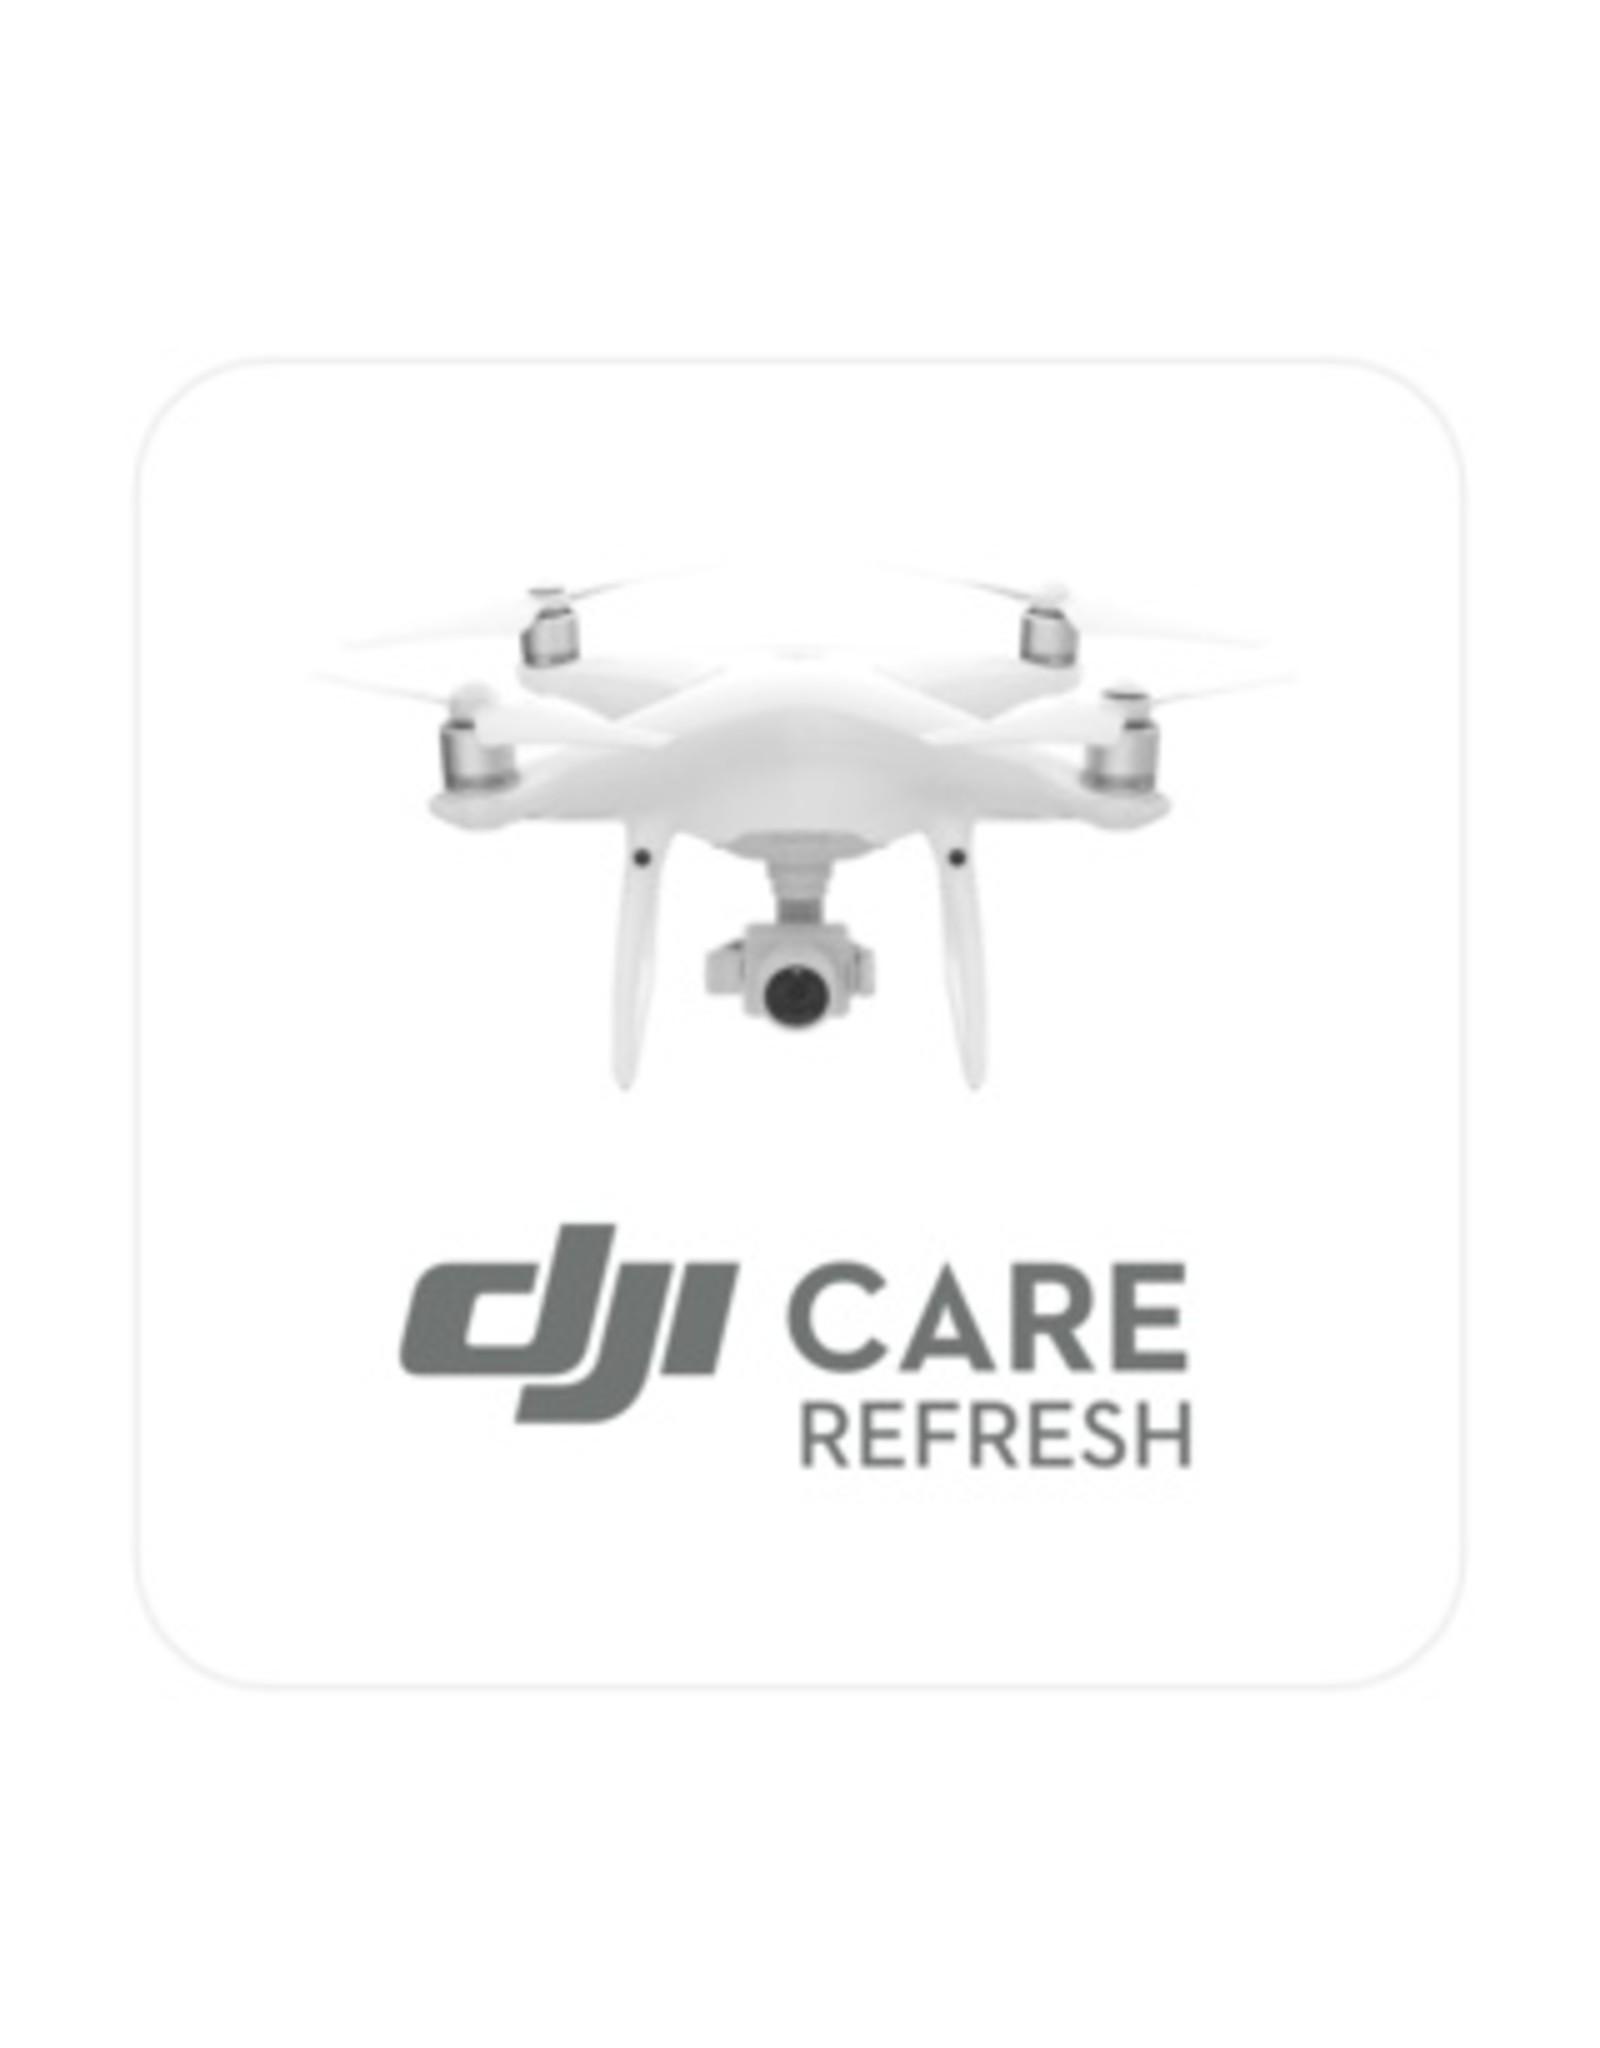 DJI DJI Care Refresh for Phantom 4Pro&4Pro+